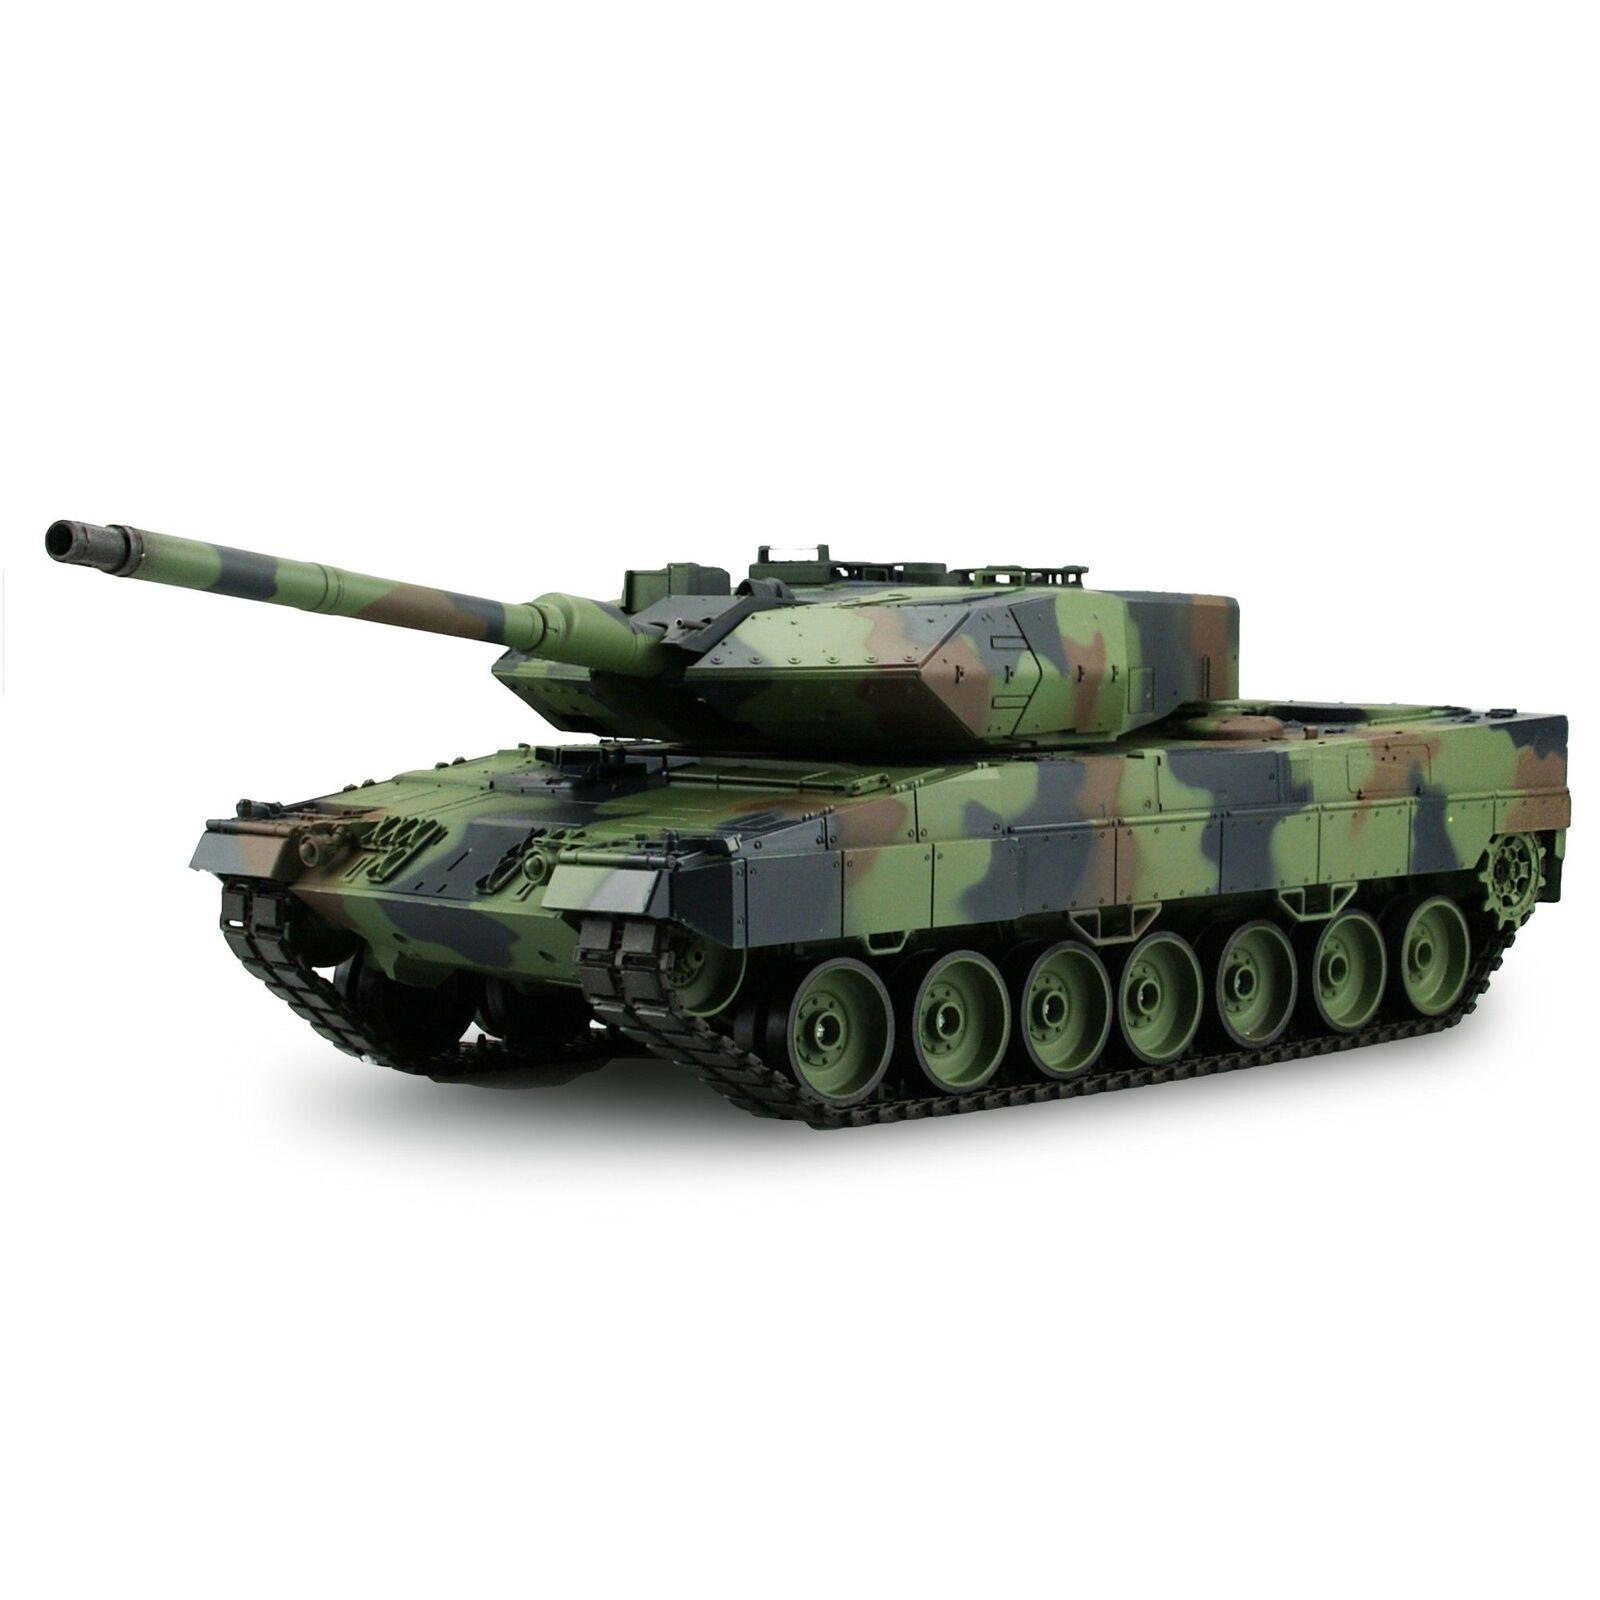 Heng Long 1:16 RC carro armato Leopard 2 a6 2,4 GHz metallo ingranaggi fumo Sound colpo